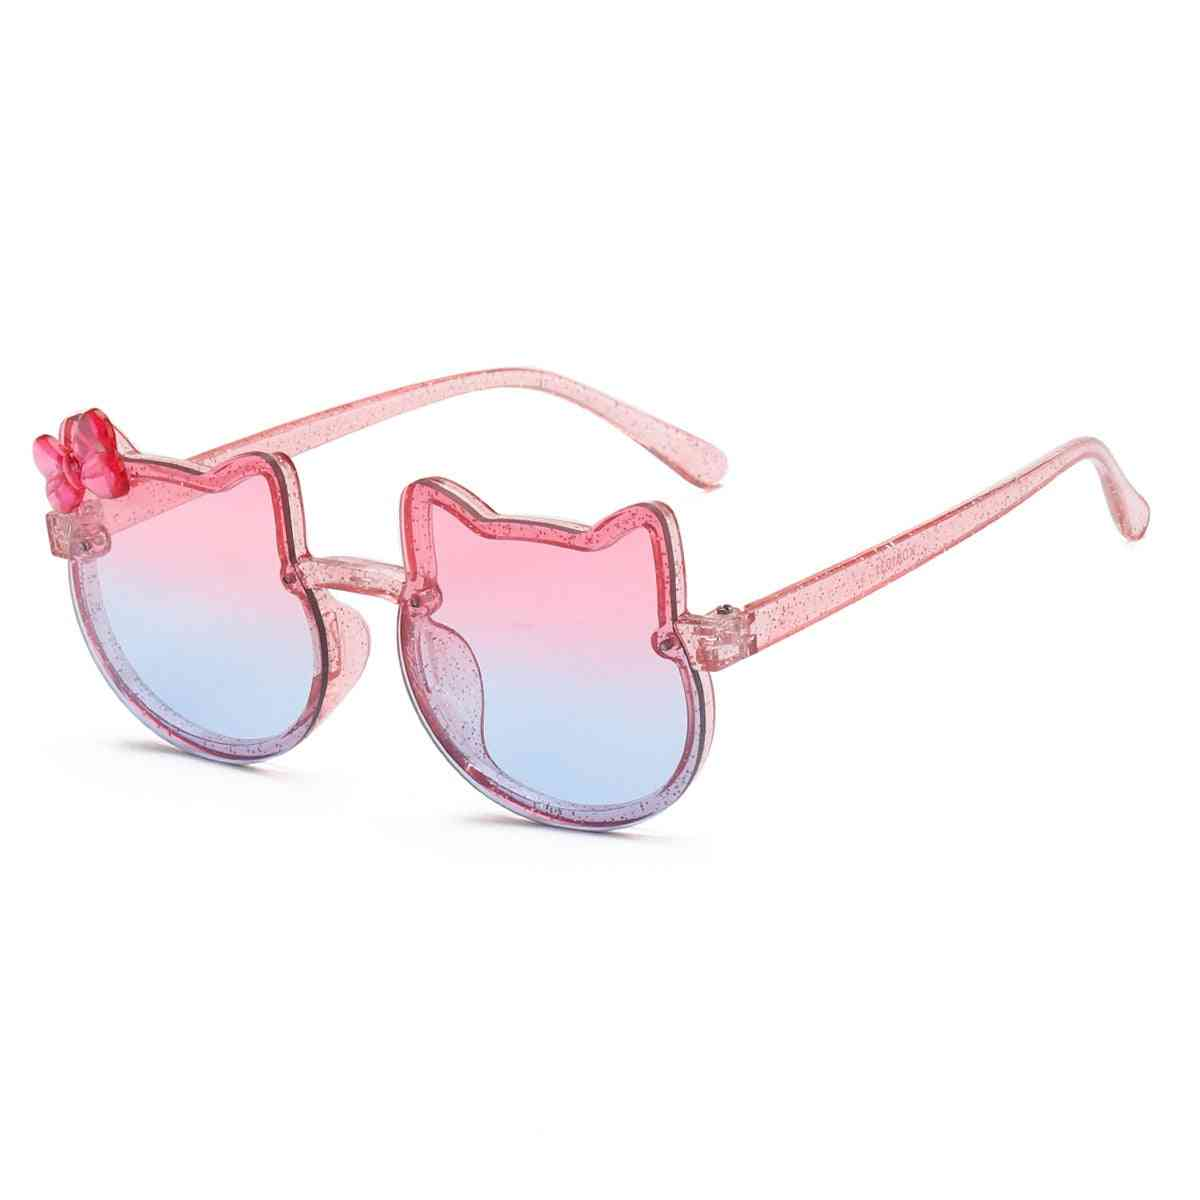 Cute Butterfly Sunglasses